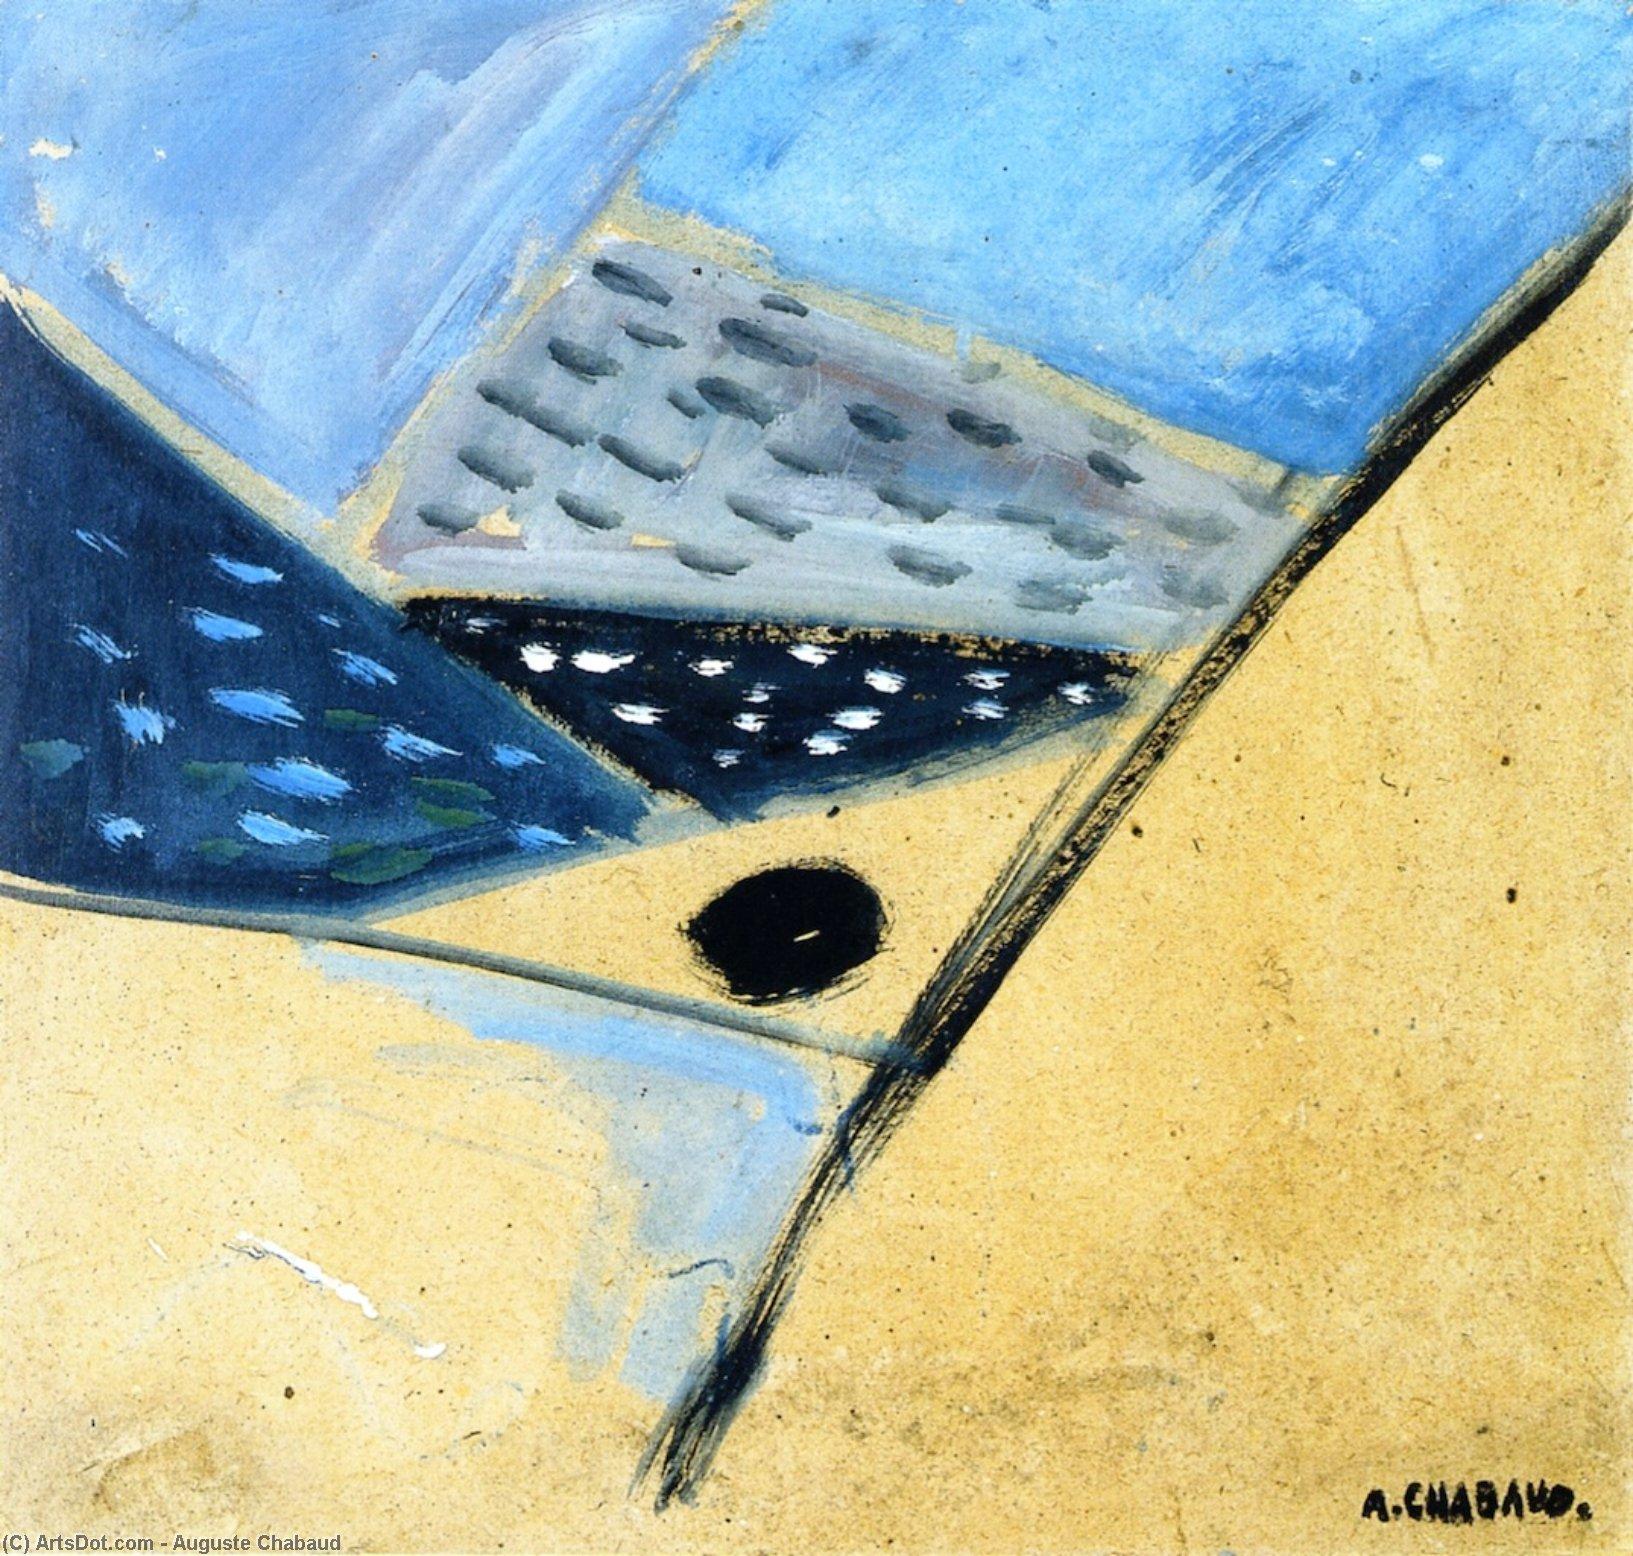 WikiOO.org - Güzel Sanatlar Ansiklopedisi - Resim, Resimler Auguste Chabaud - Landscape (abstract)